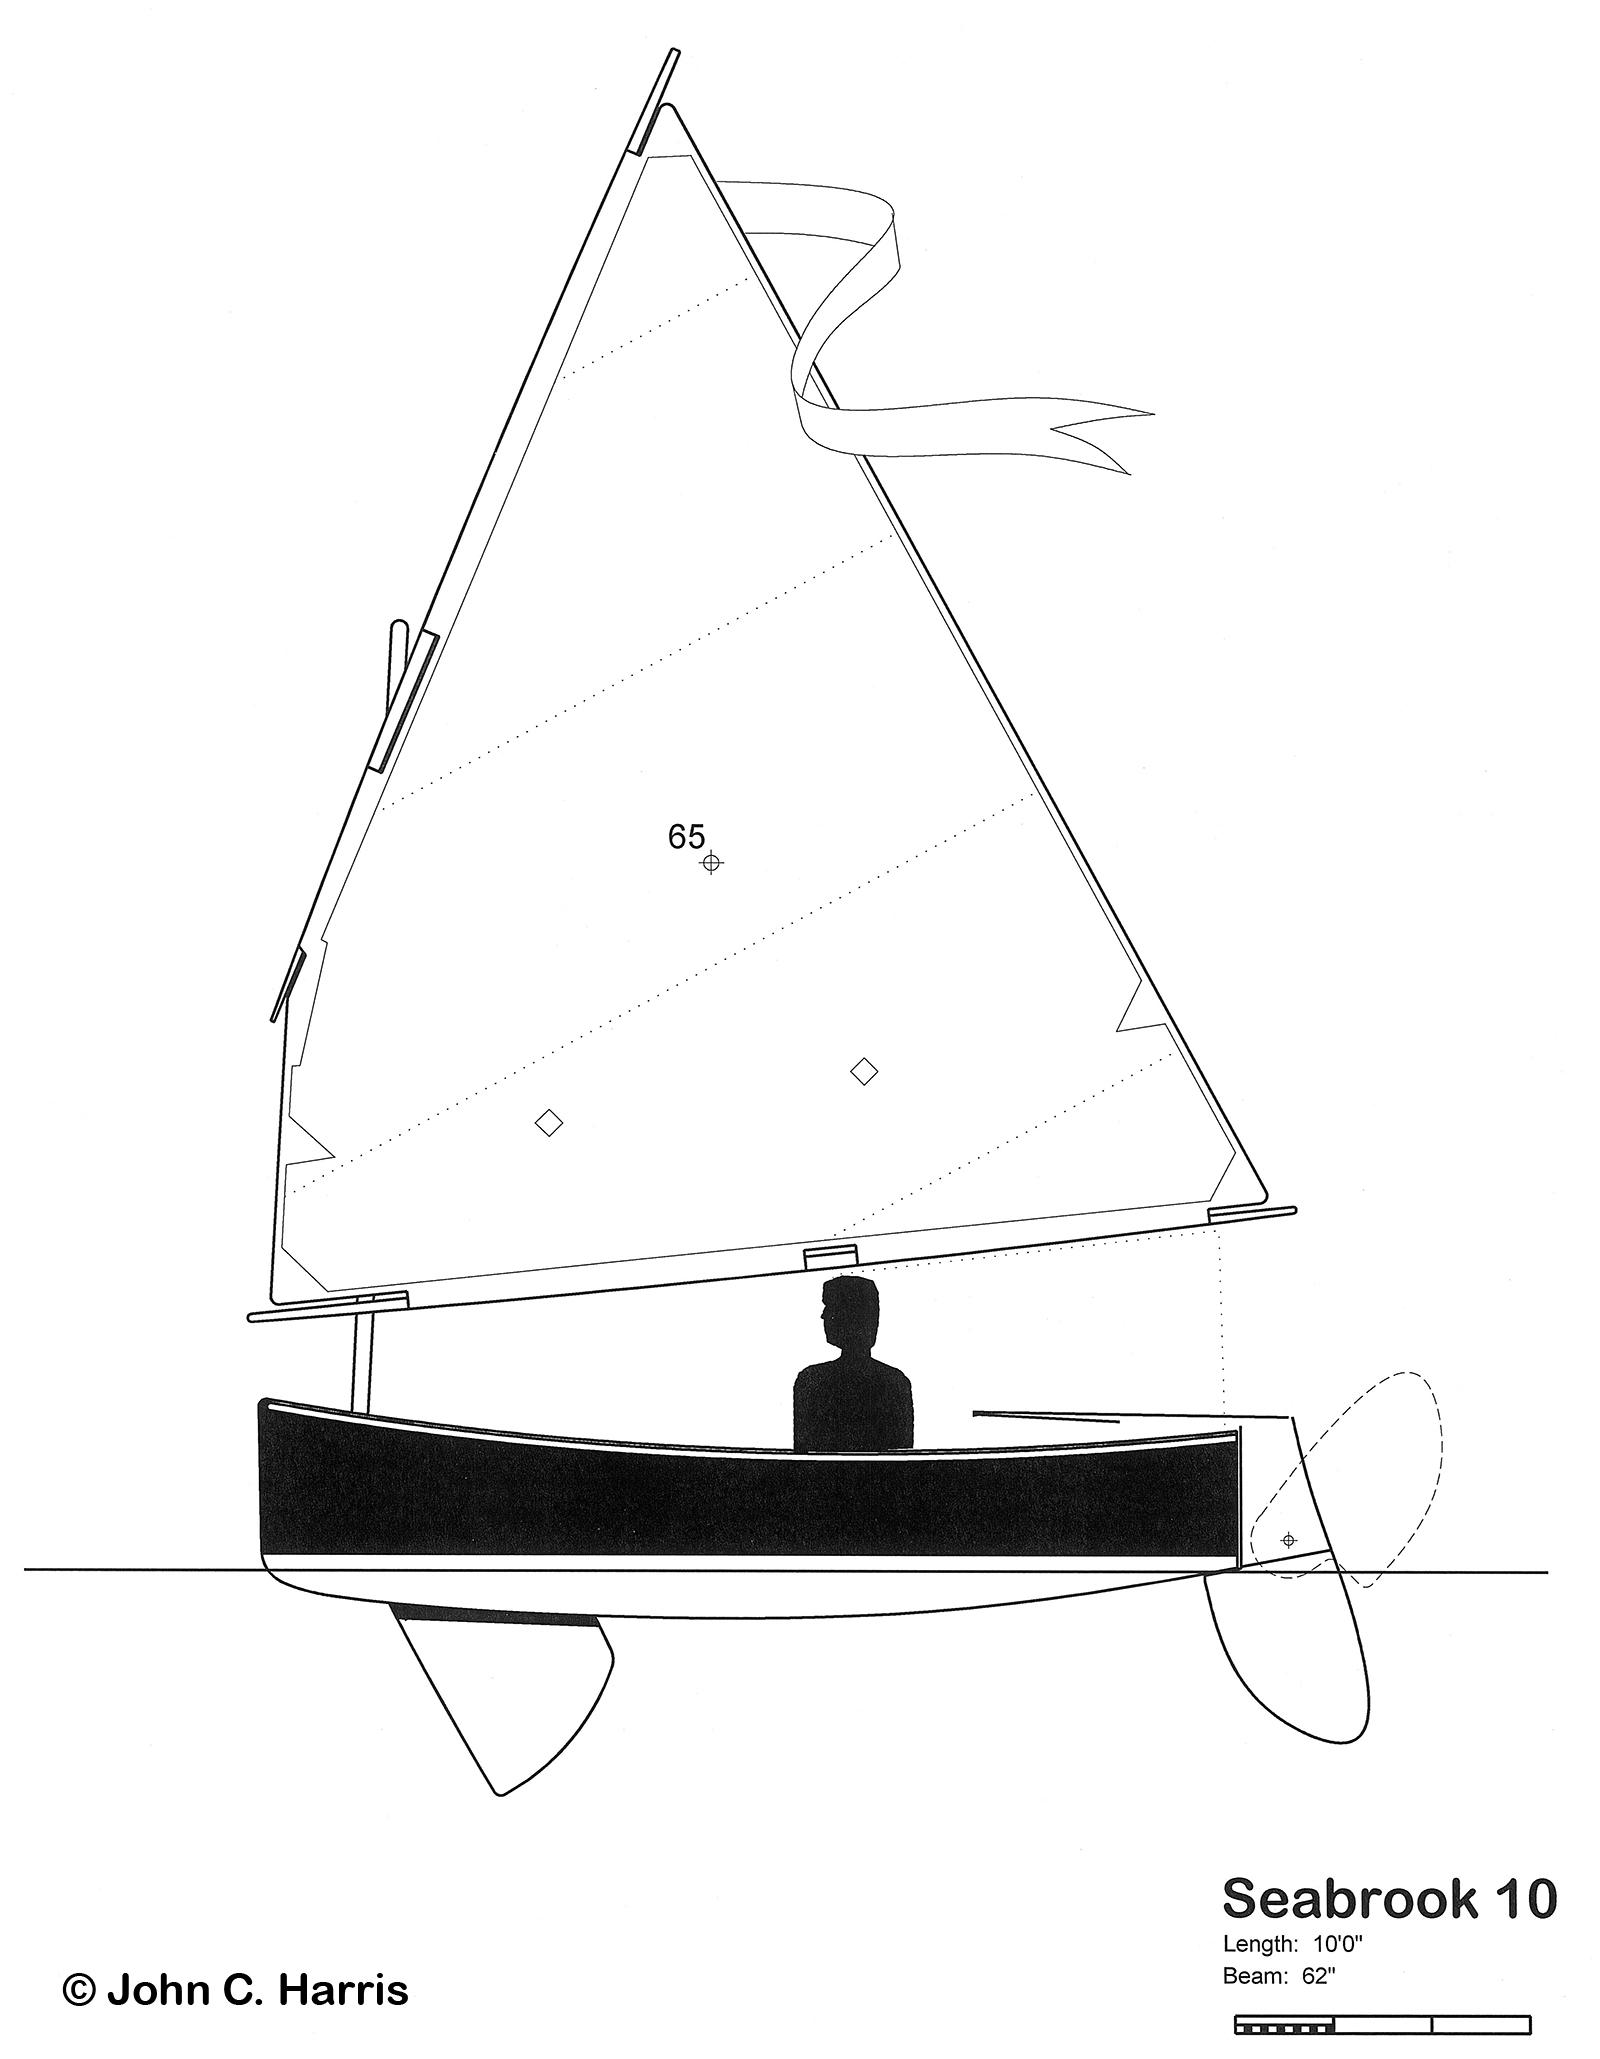 10-foot Seabrook Dinghy